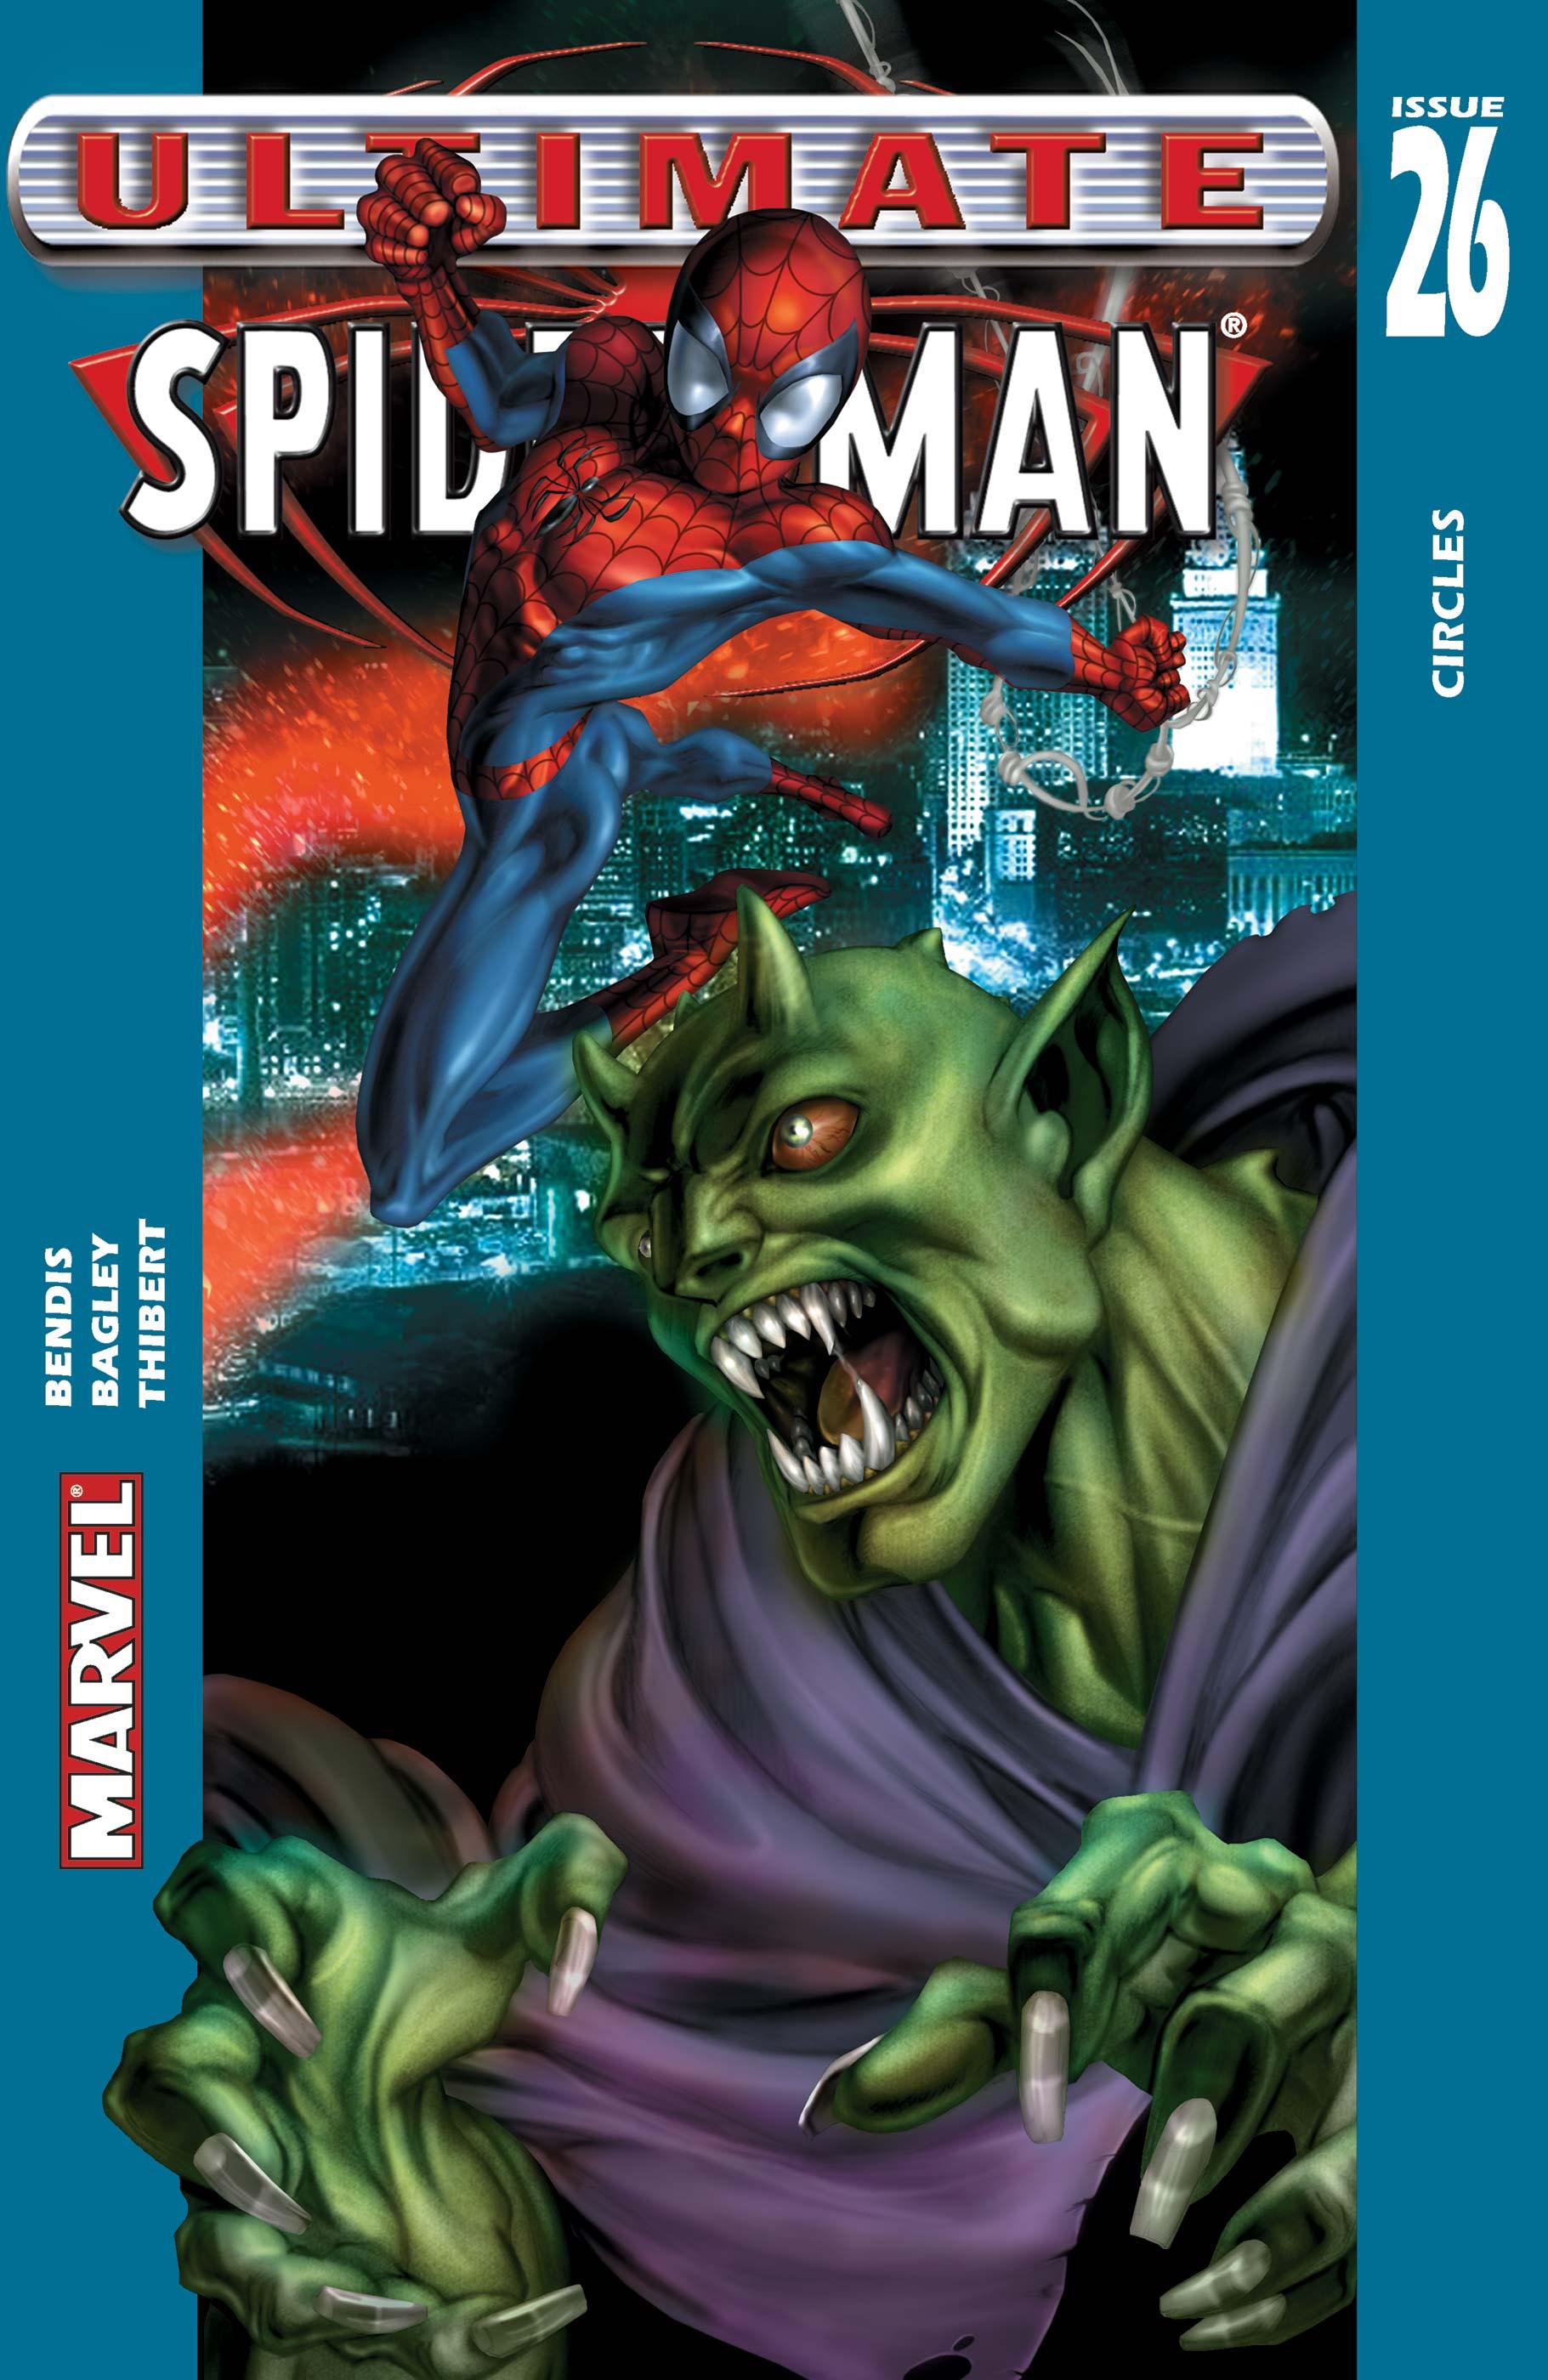 Ultimate Spider-Man (2000) #26